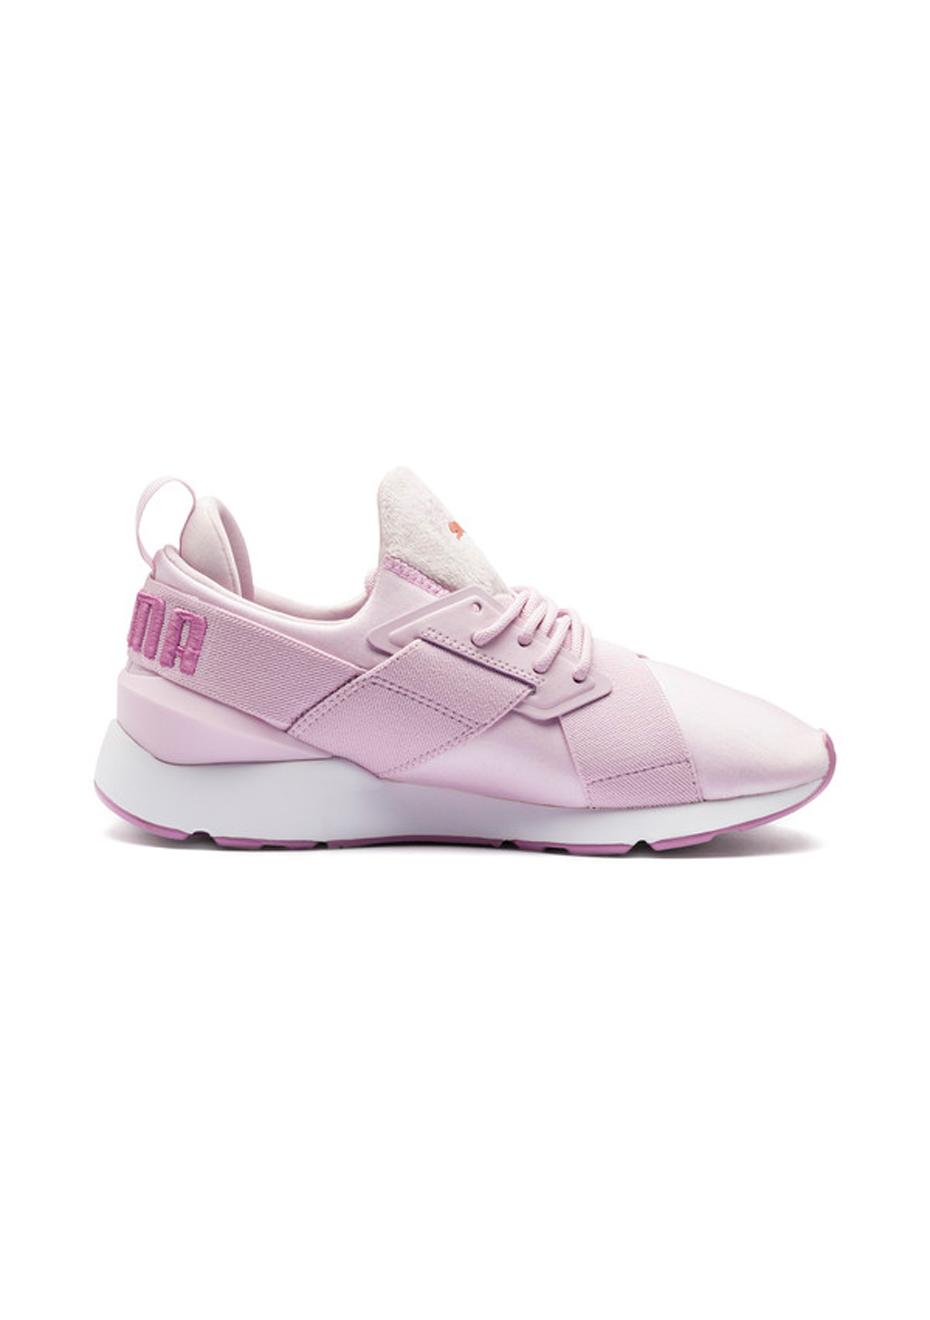 Puma Muse Satin II Women's Shoe NWT